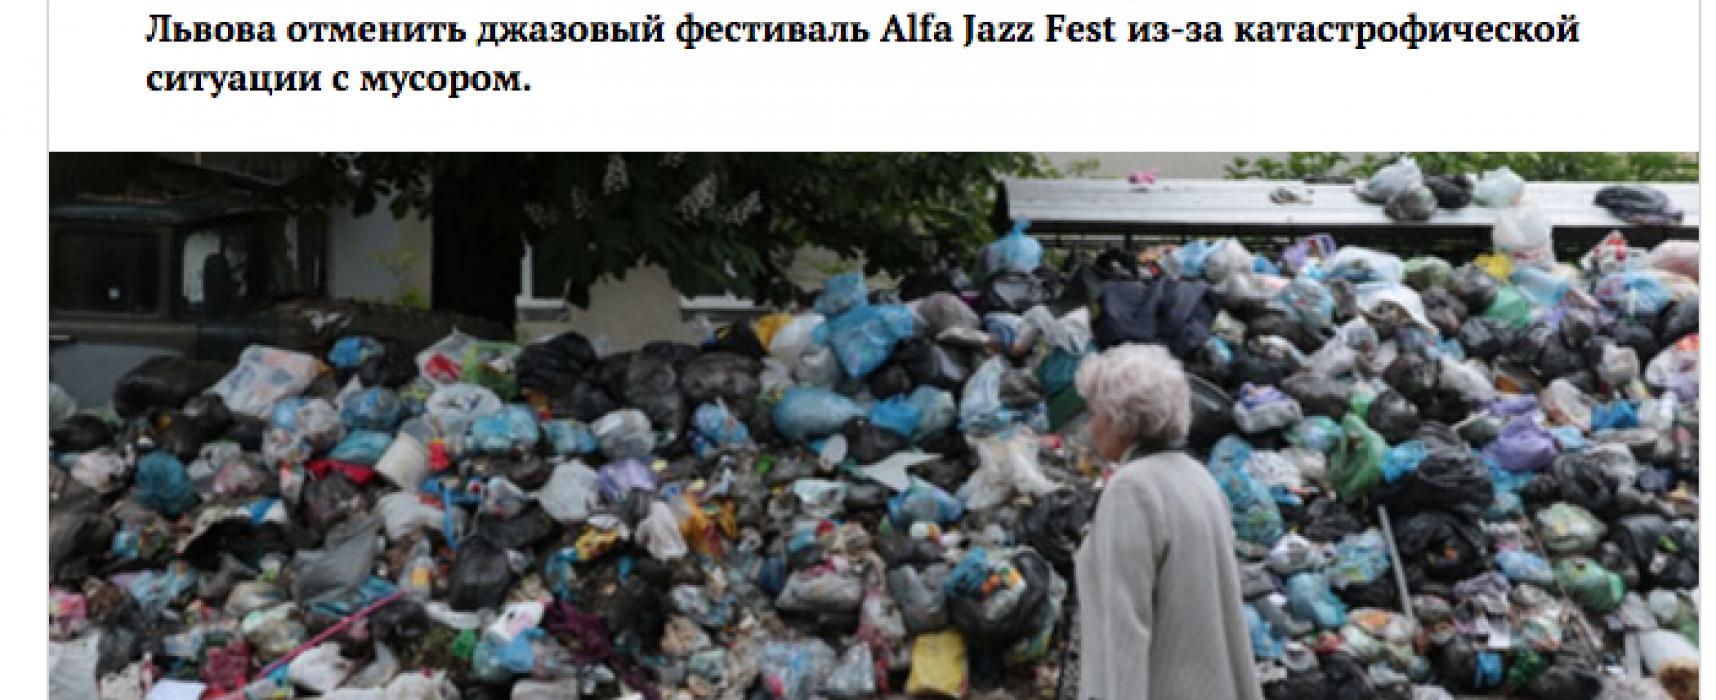 Фейк: В Лвив отменят джазов фестивал заради боклука